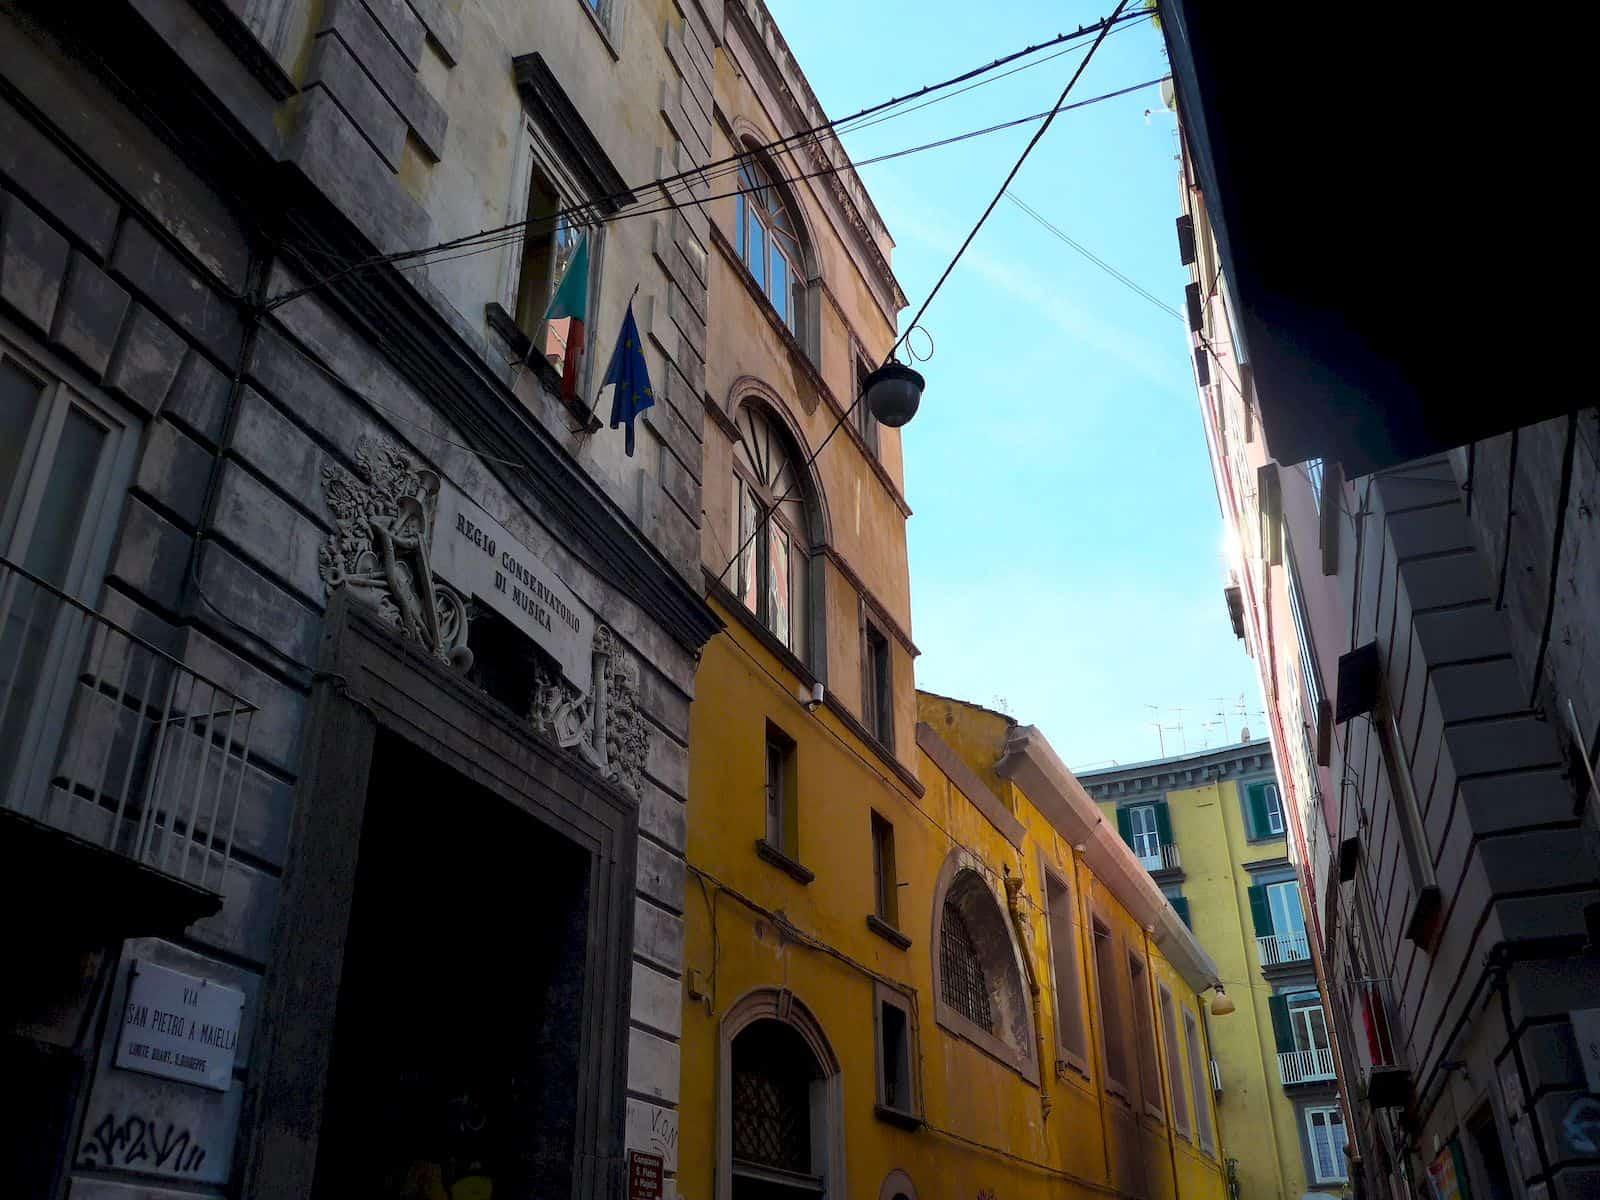 Via San Pietro a Majella